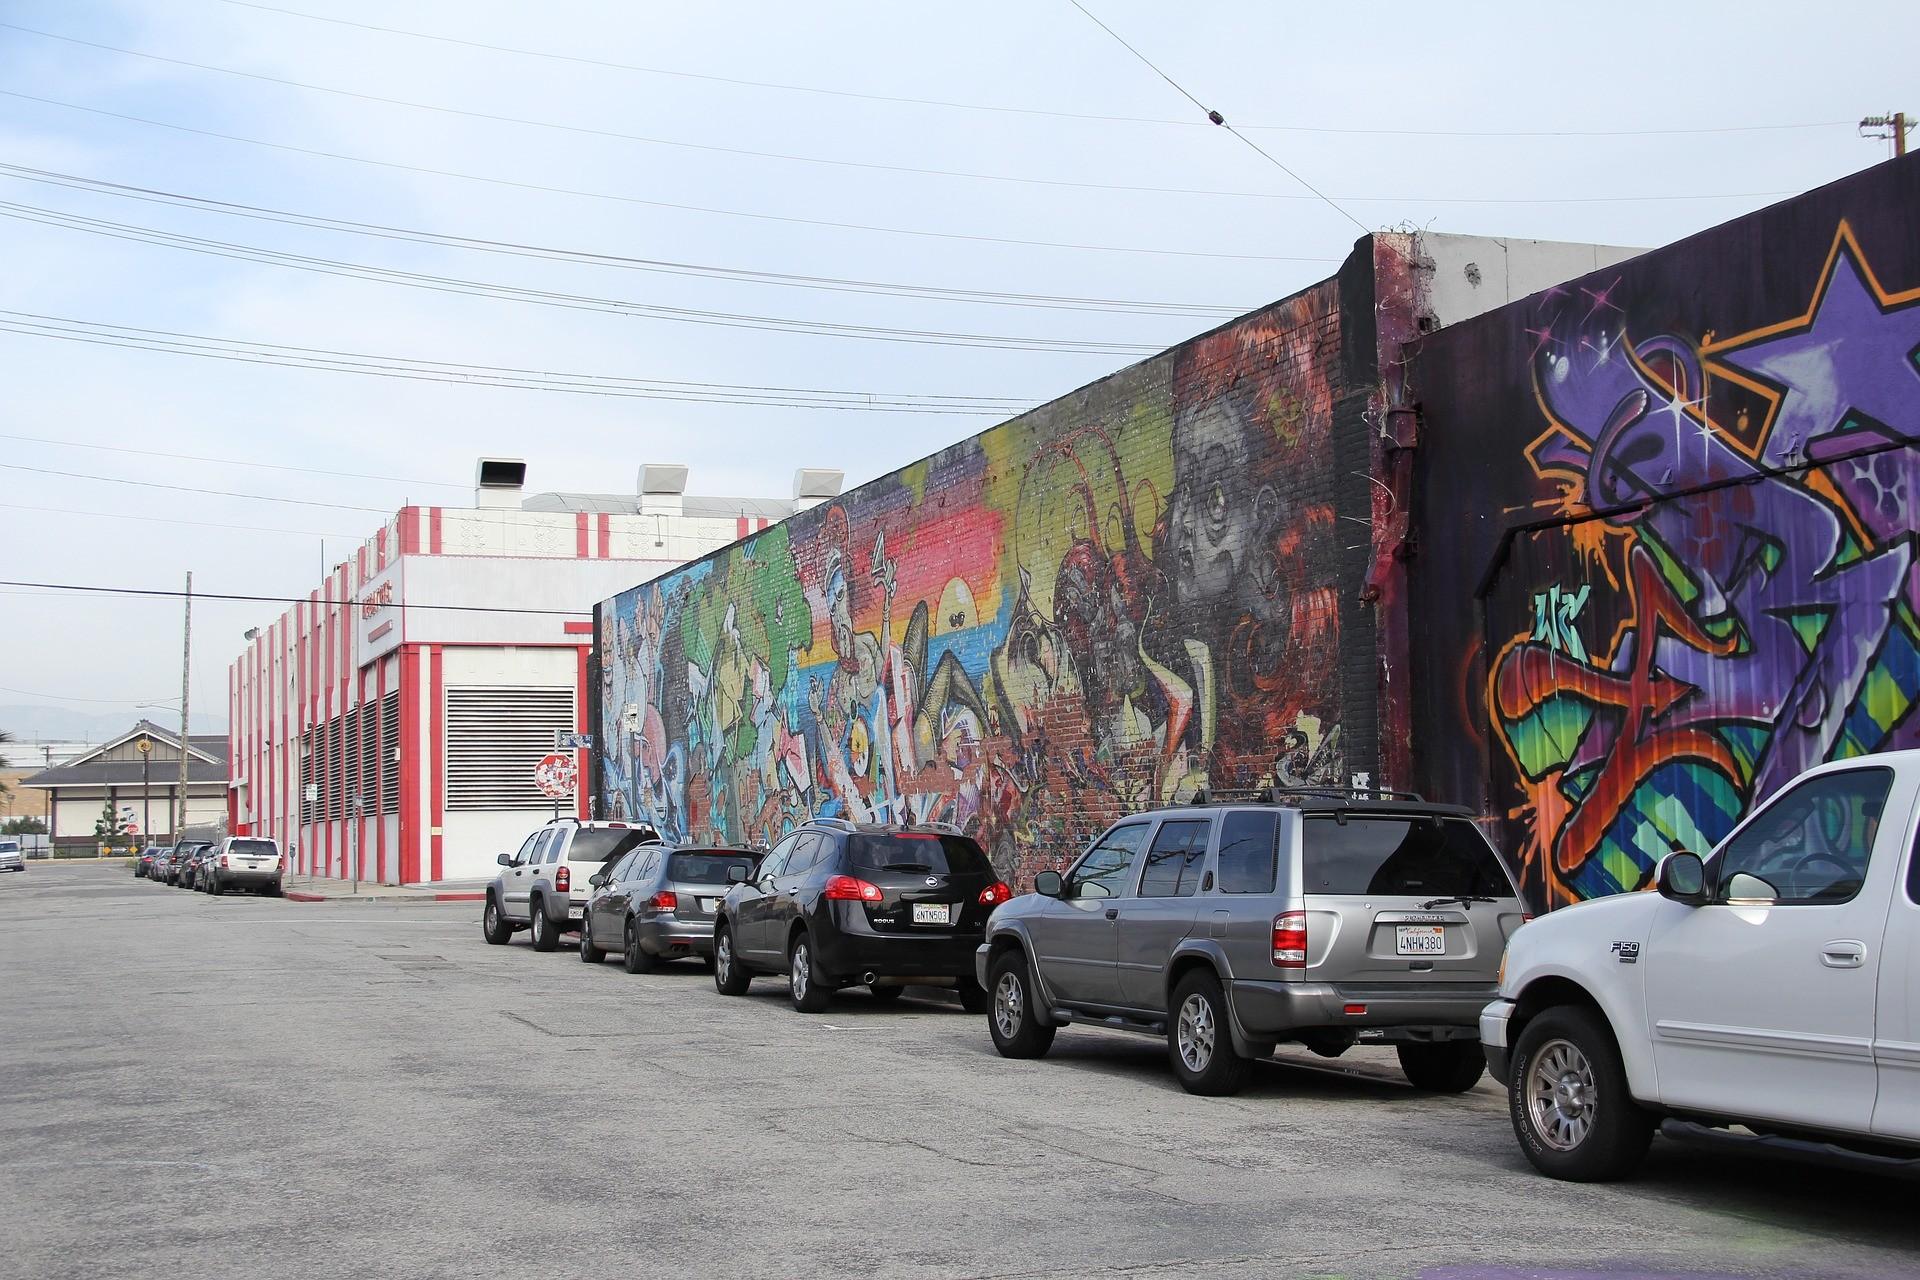 parking space in Los Angeles